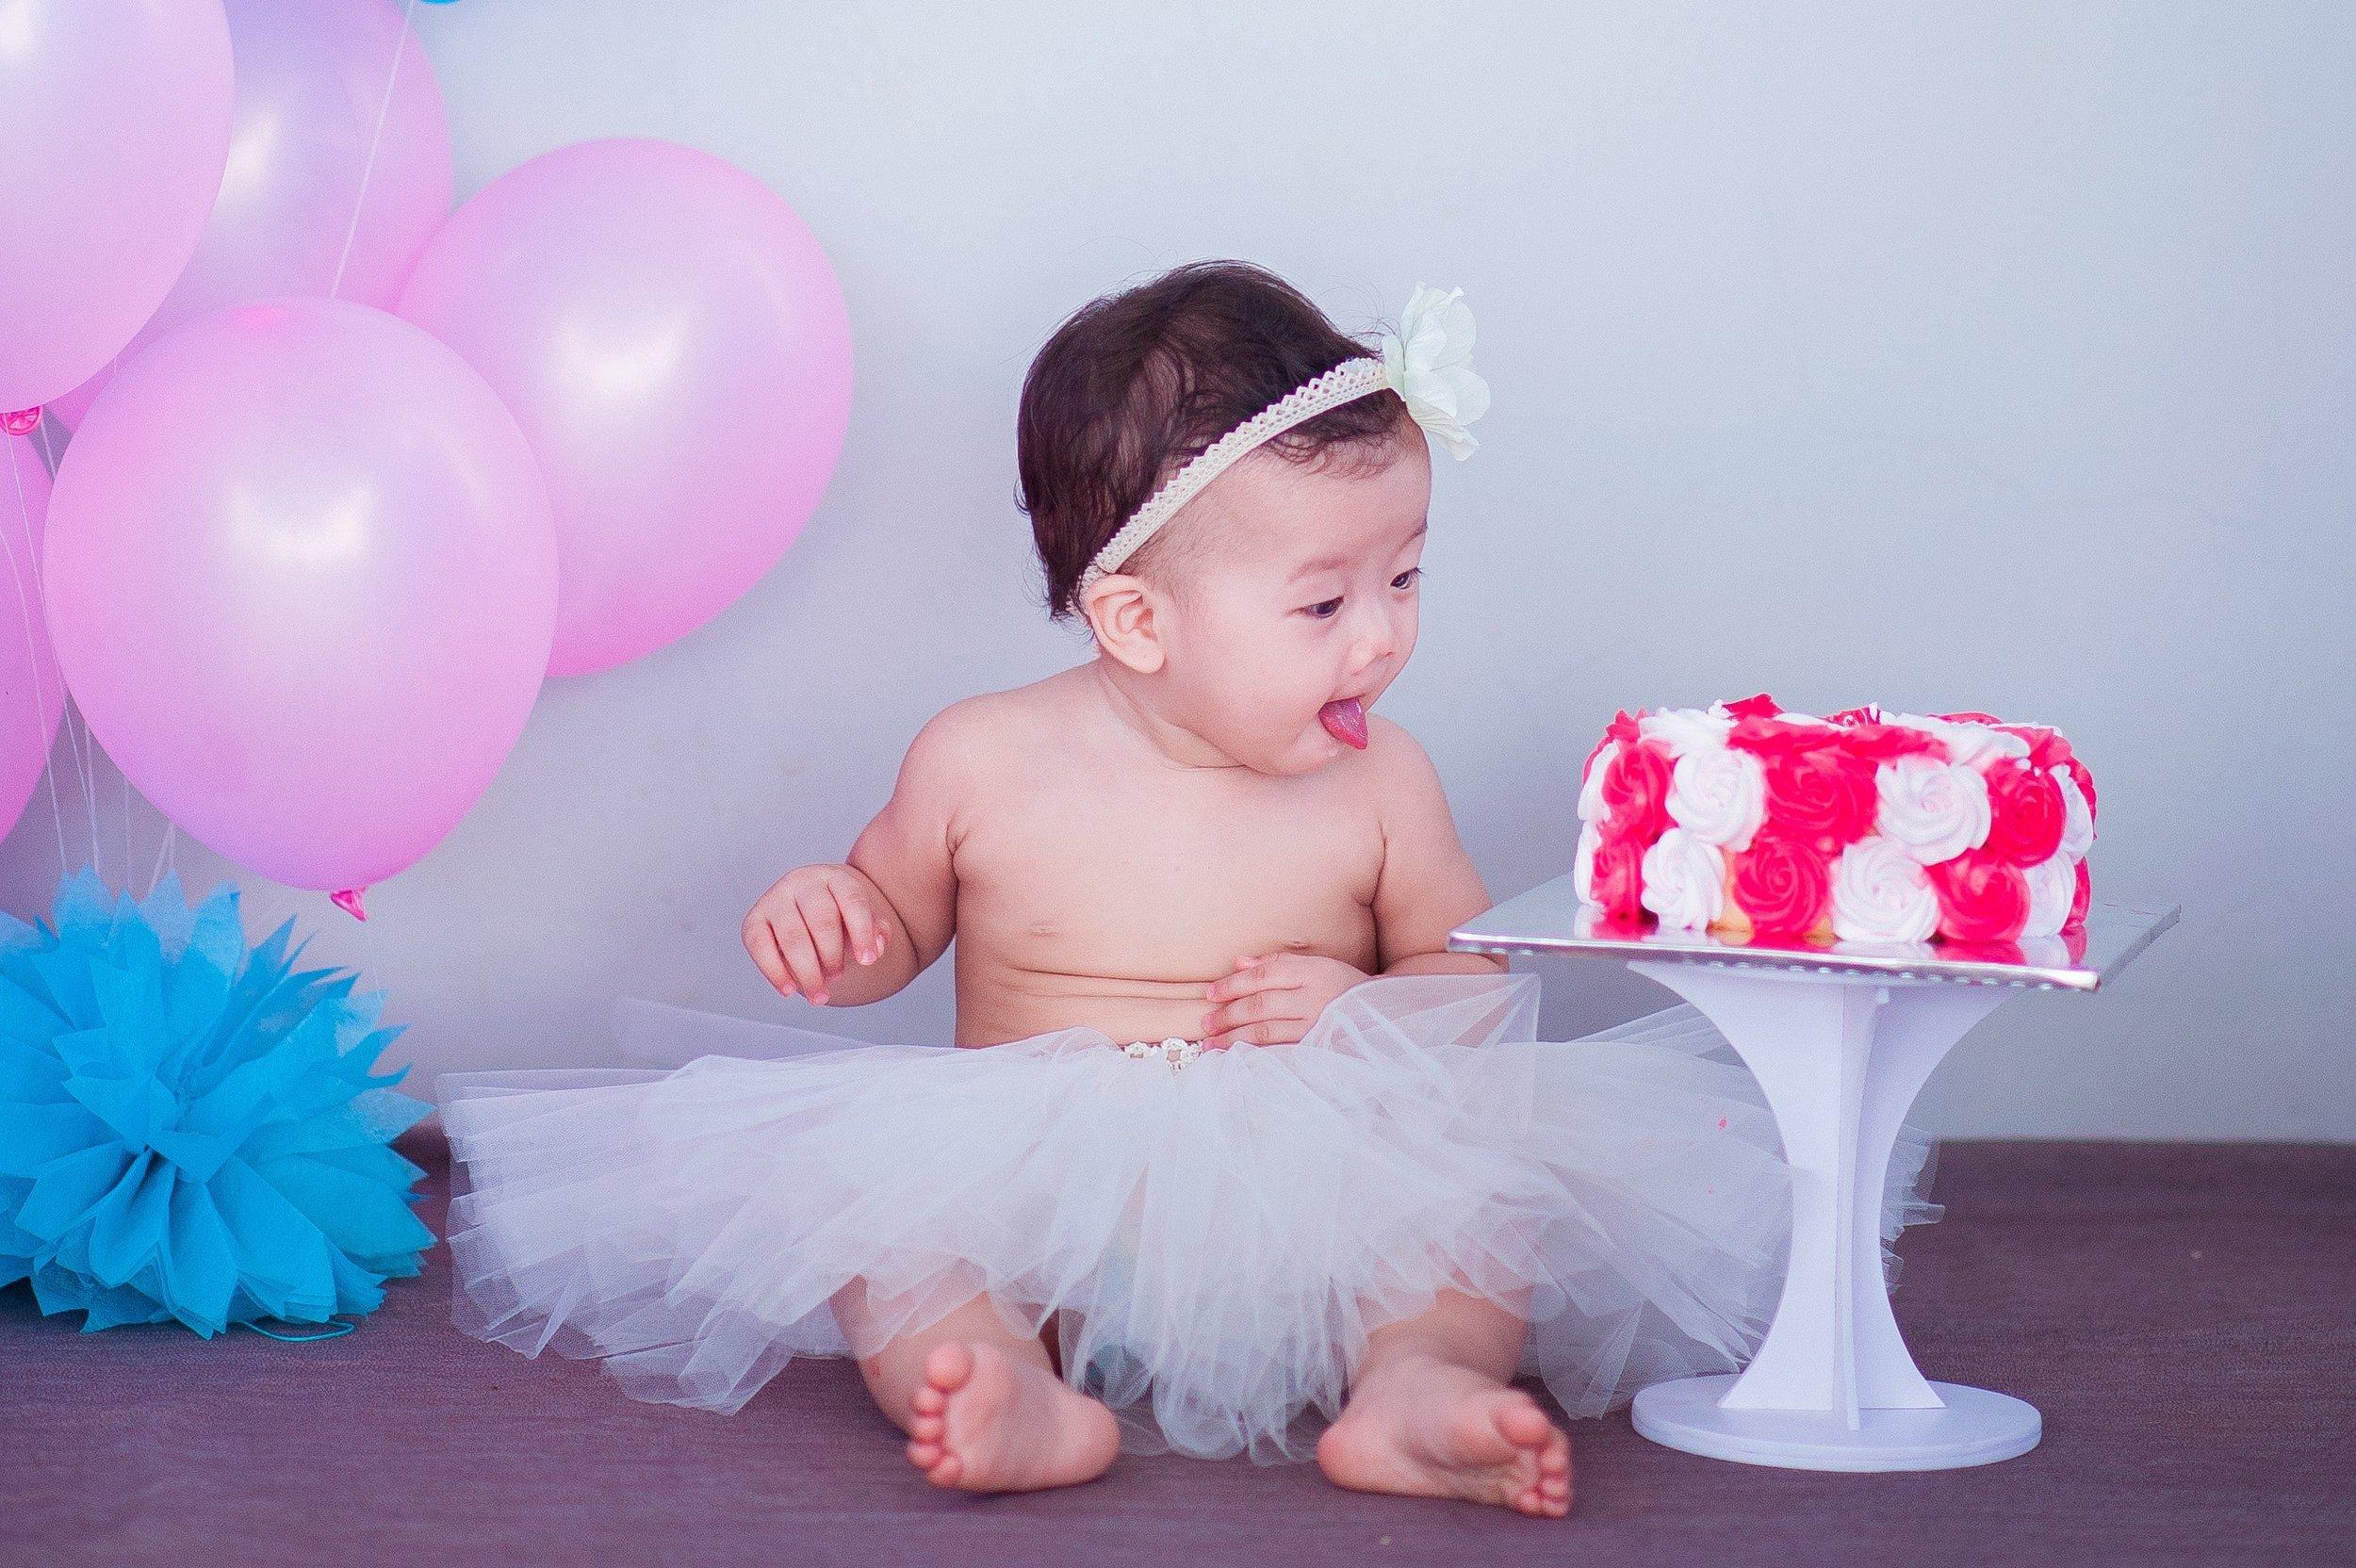 adorable-baby-beautiful-206347.jpg